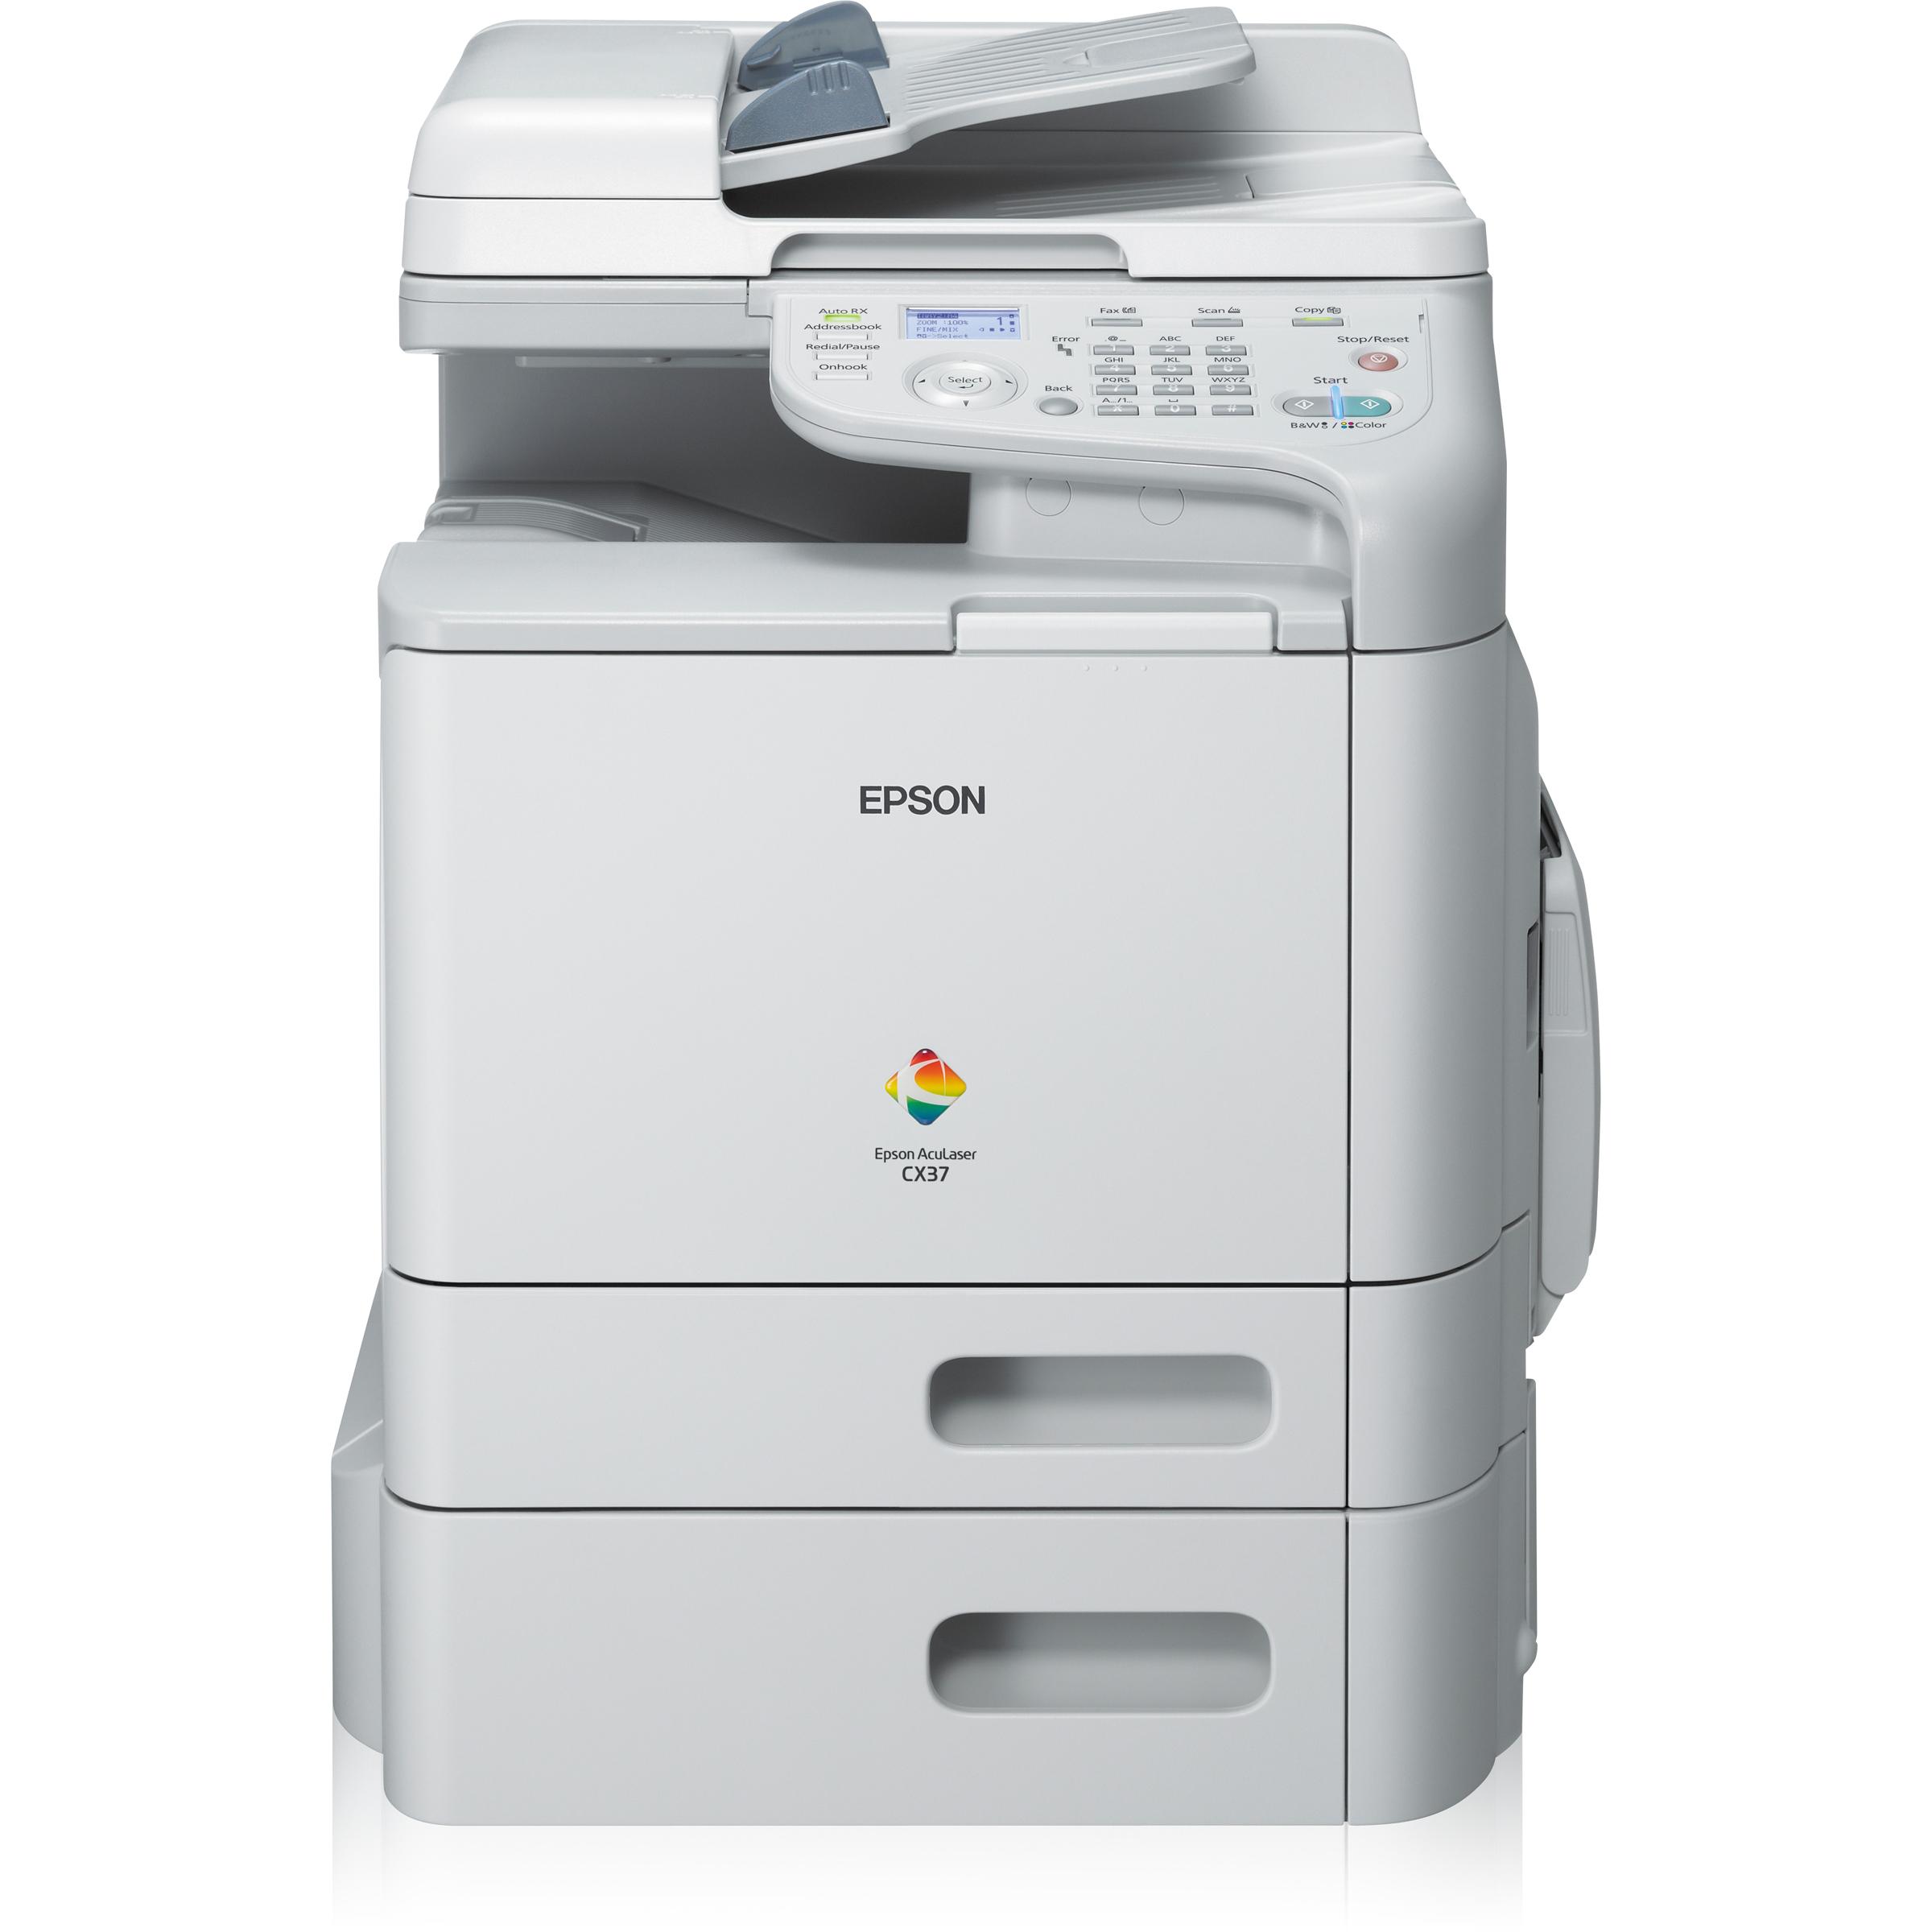 Epson AcuLaser CX37DTN Laser Multifunction Printer - Colour - Plain Paper Print - Desktop